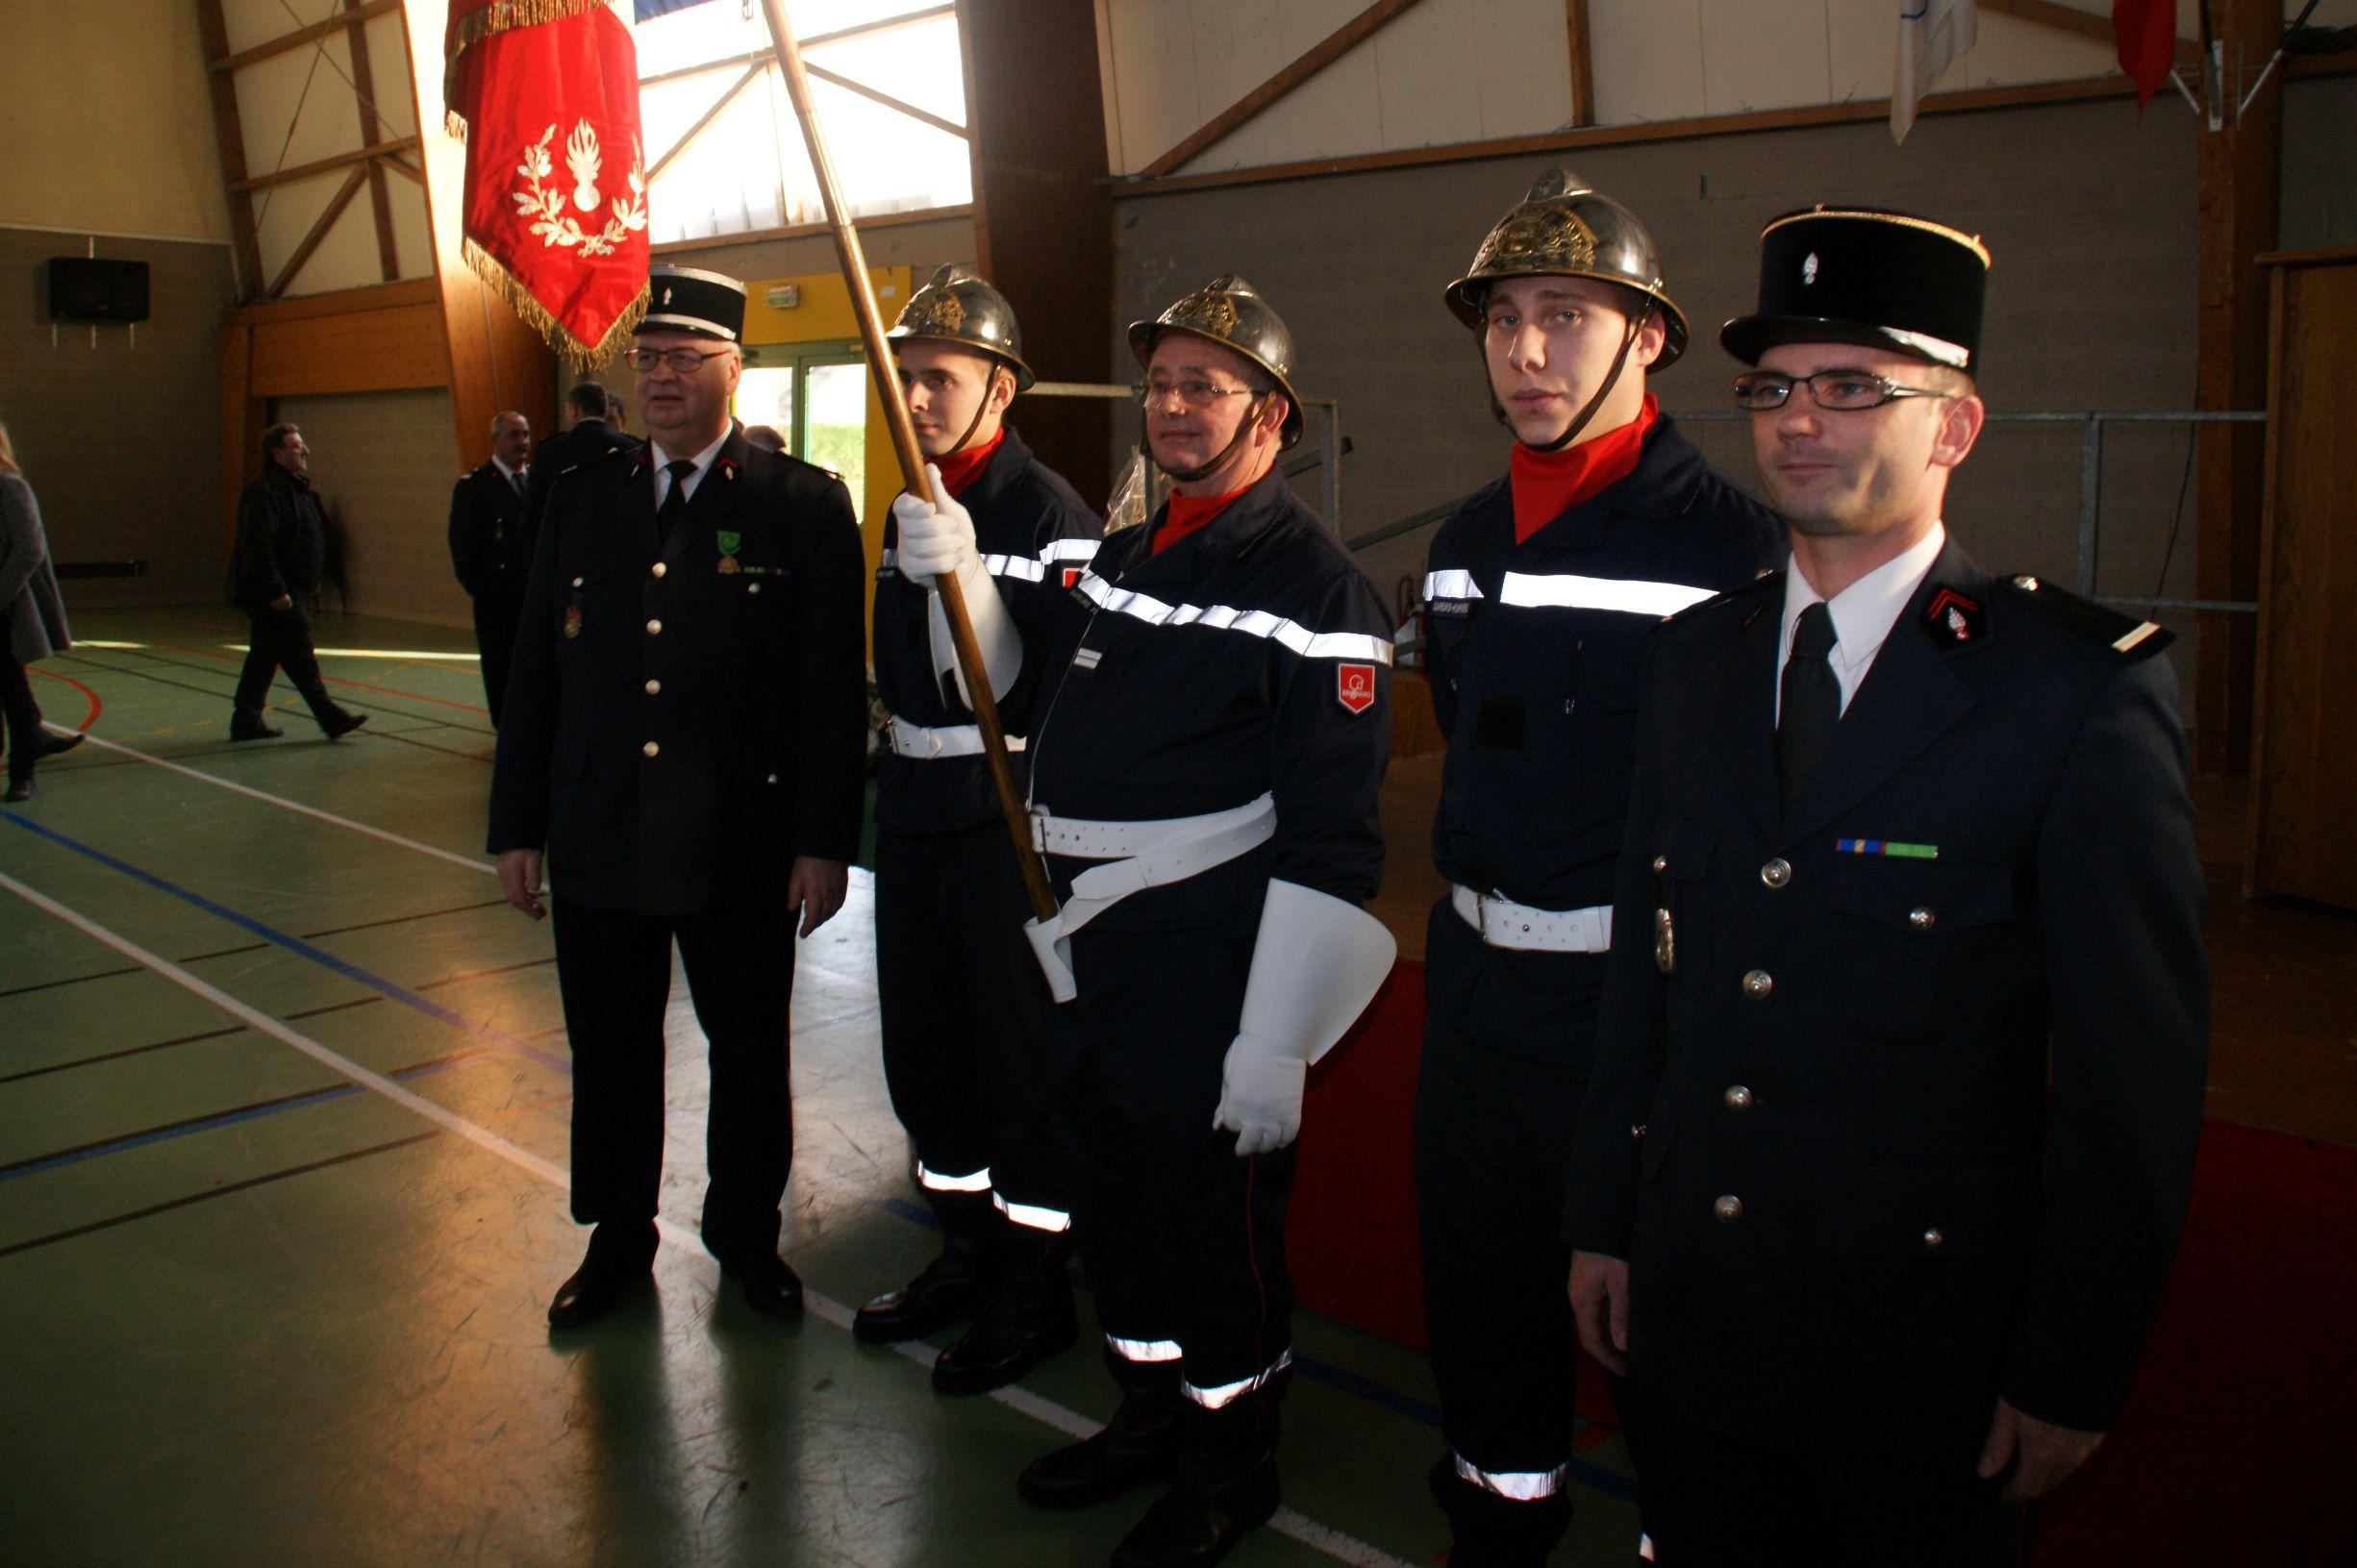 Pompiers_3.JPG